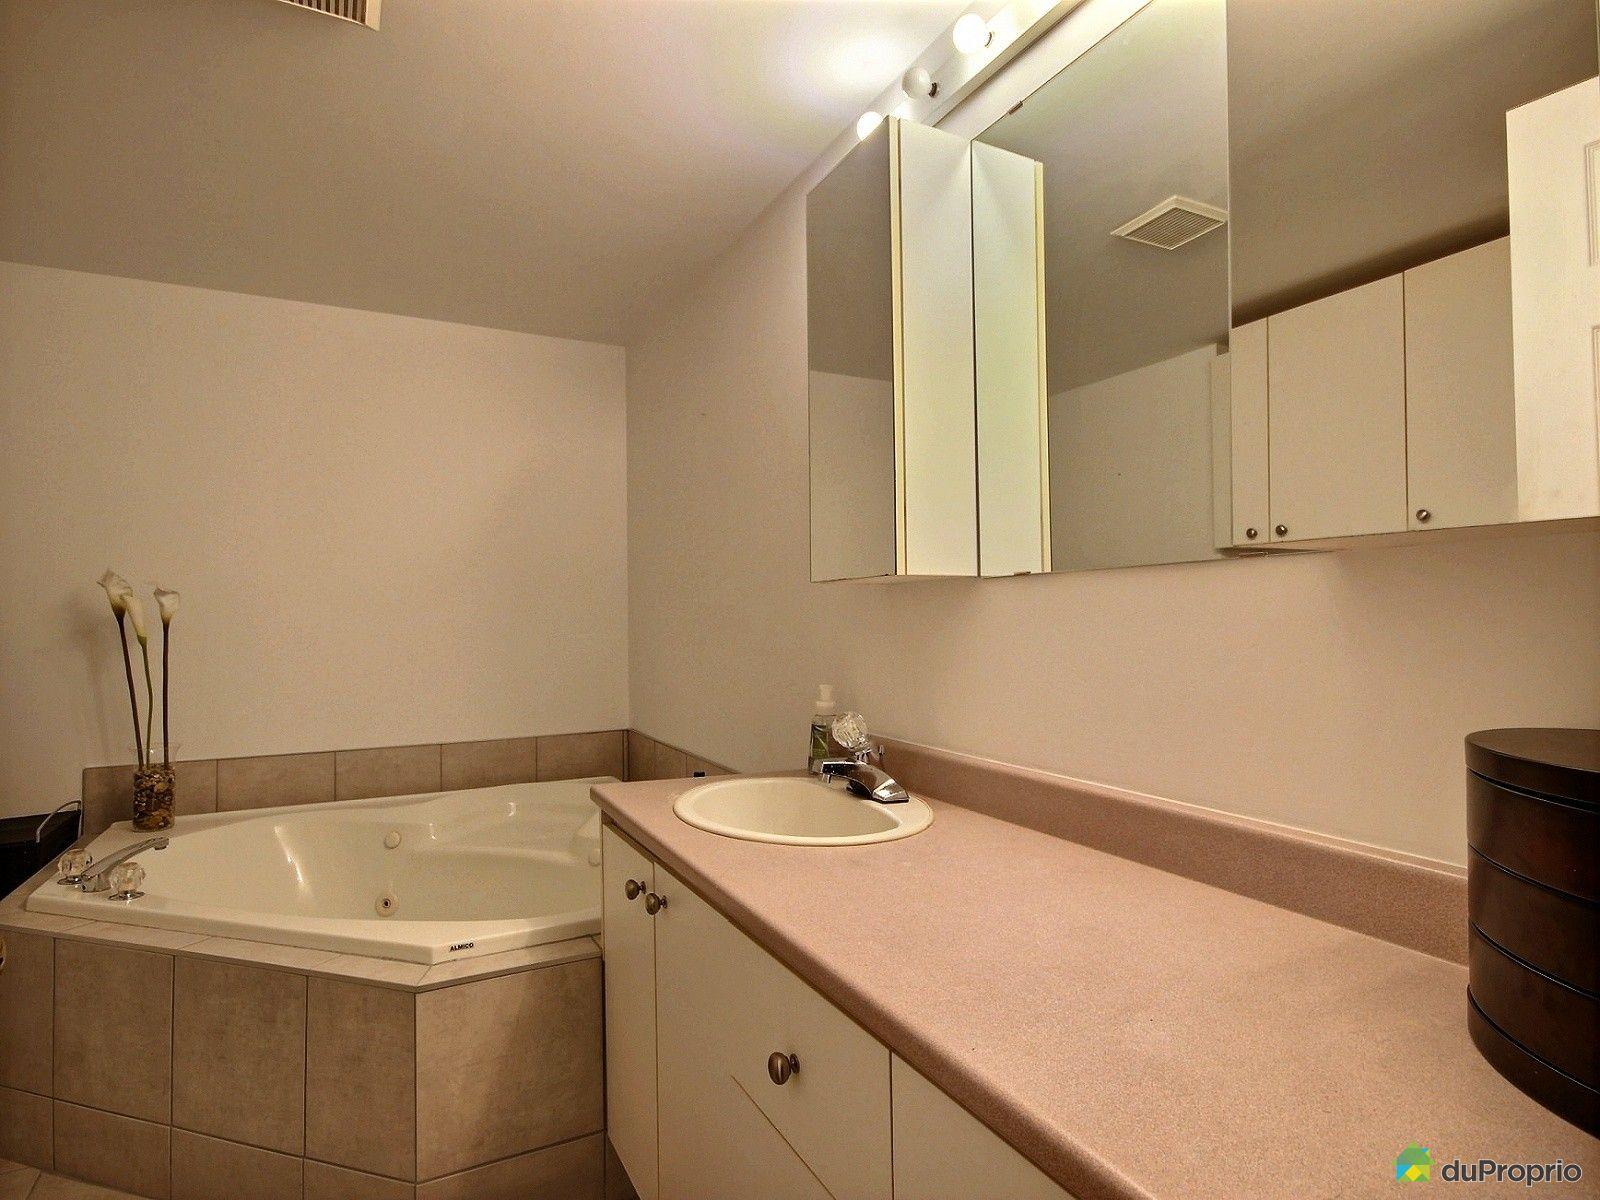 Condo vendre gatineau 302 75 rue du coteau immobilier for Reno salle de bain quebec